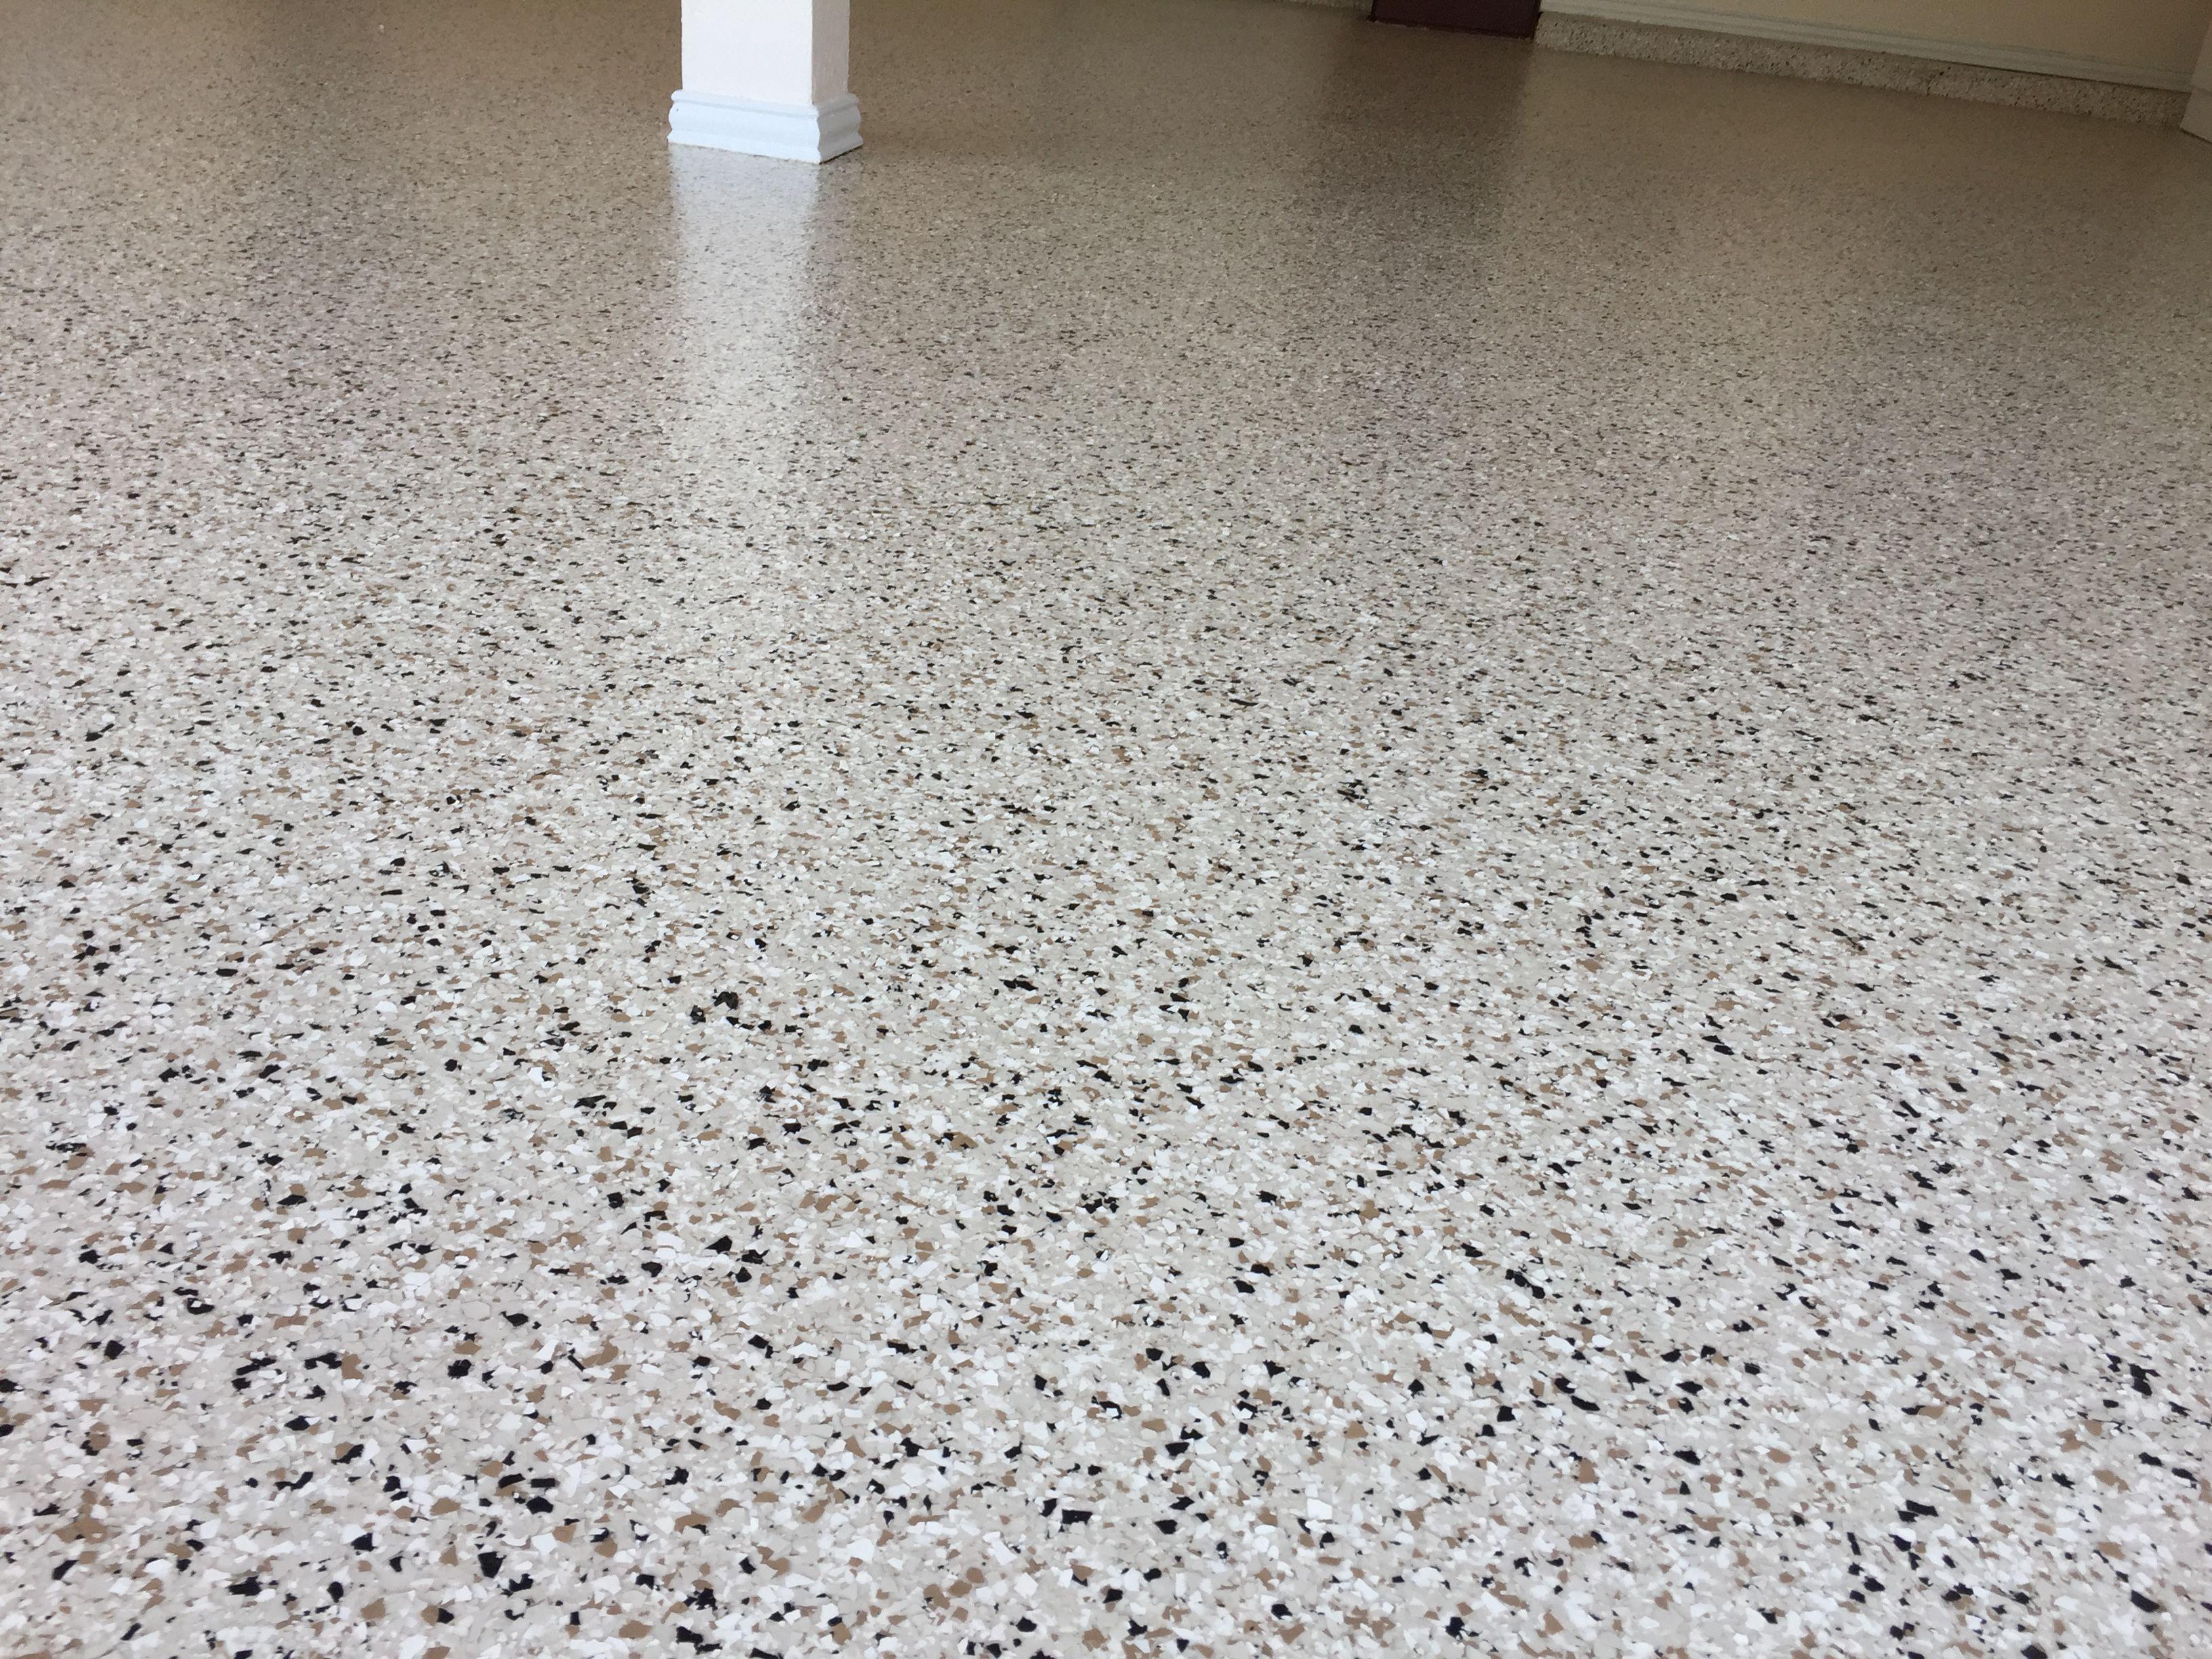 Epoxy Garage Floor Covering Epoxy Garage Floor Coating Garage